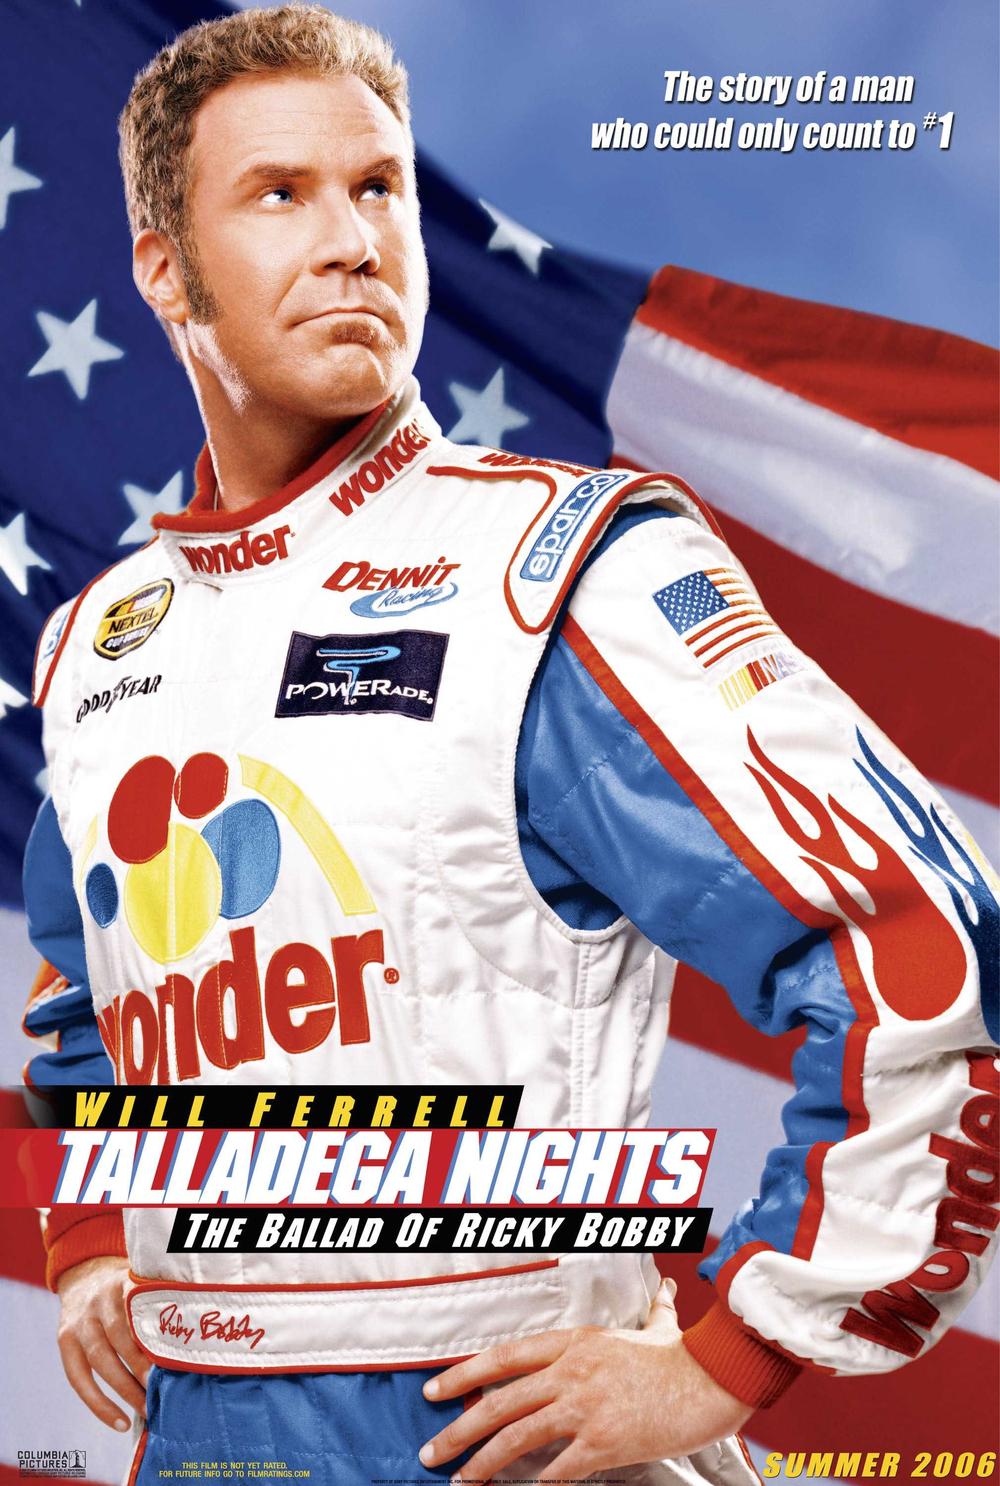 2006-Talladega Nights-01.jpg